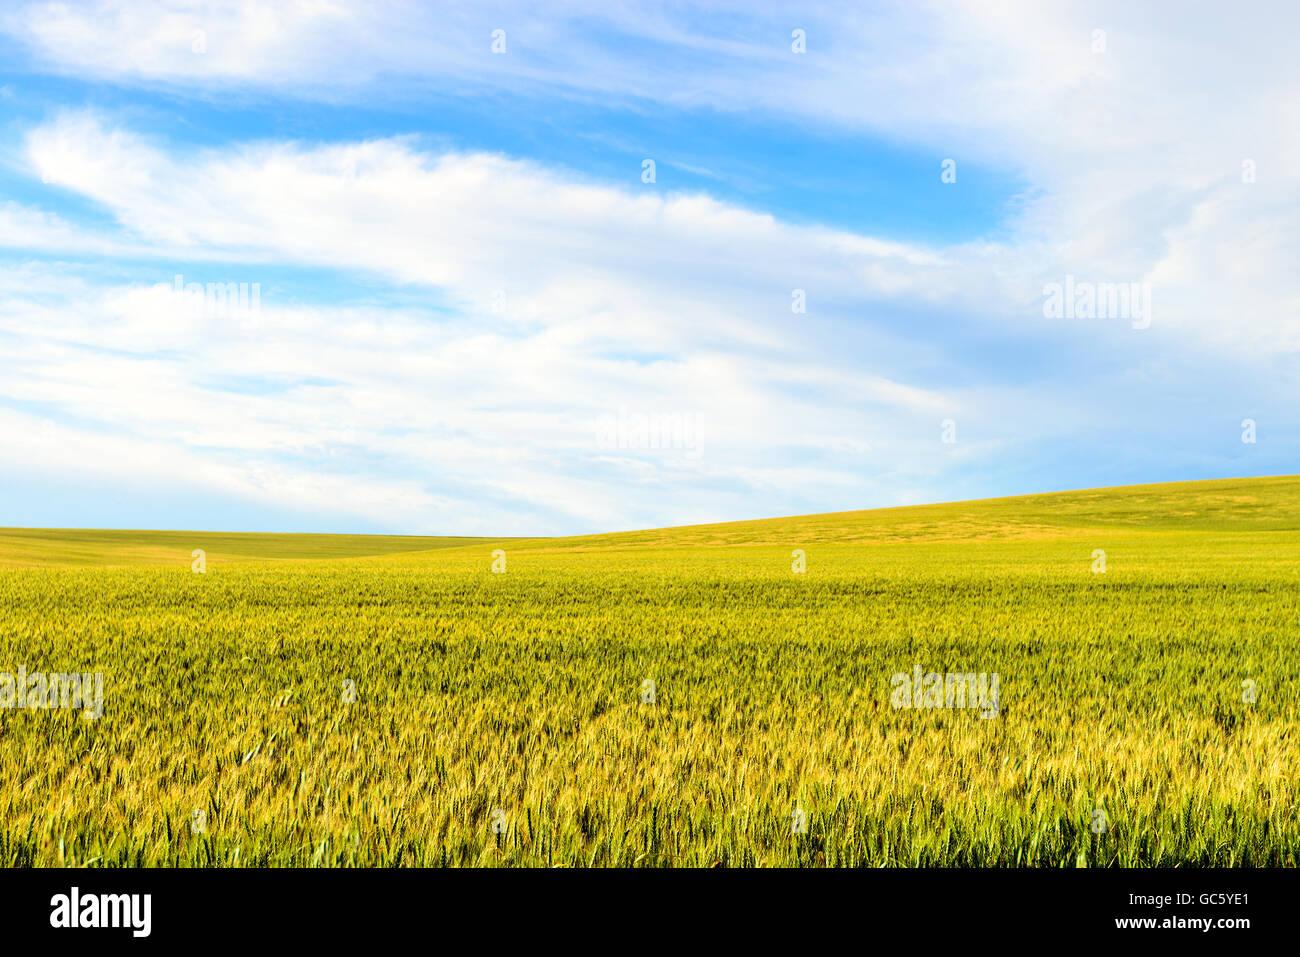 Green wheat field in Barossa Valley, South Australia - Stock Image